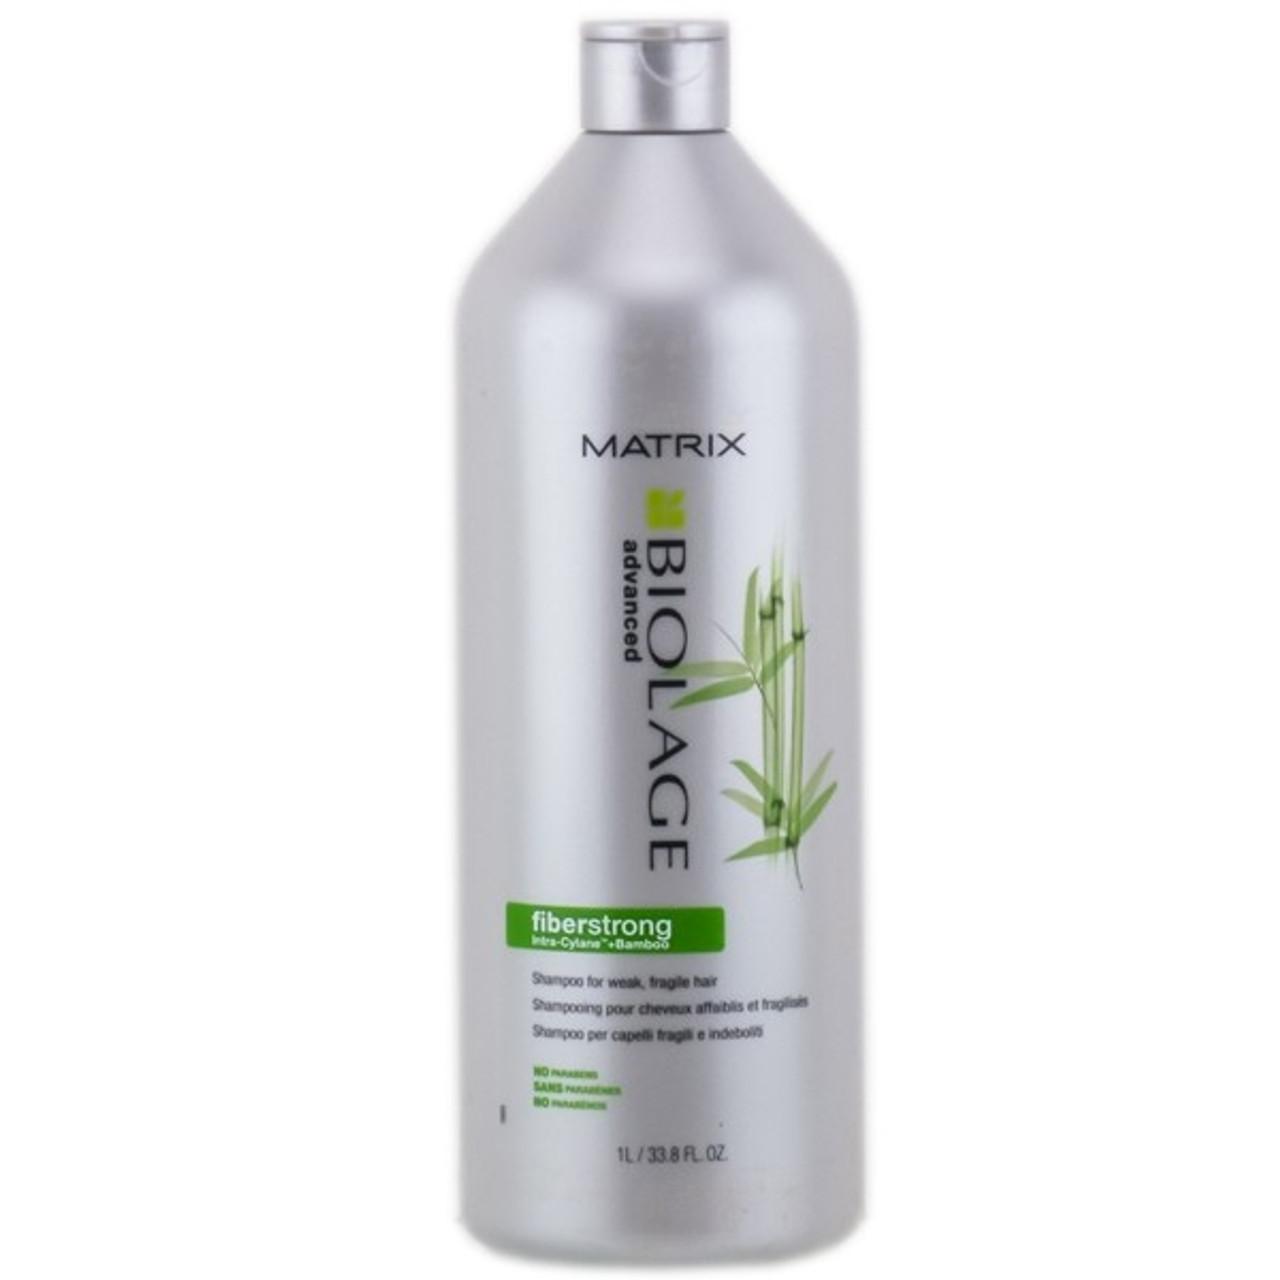 Biolage Fiberstrong Shampoo Liter